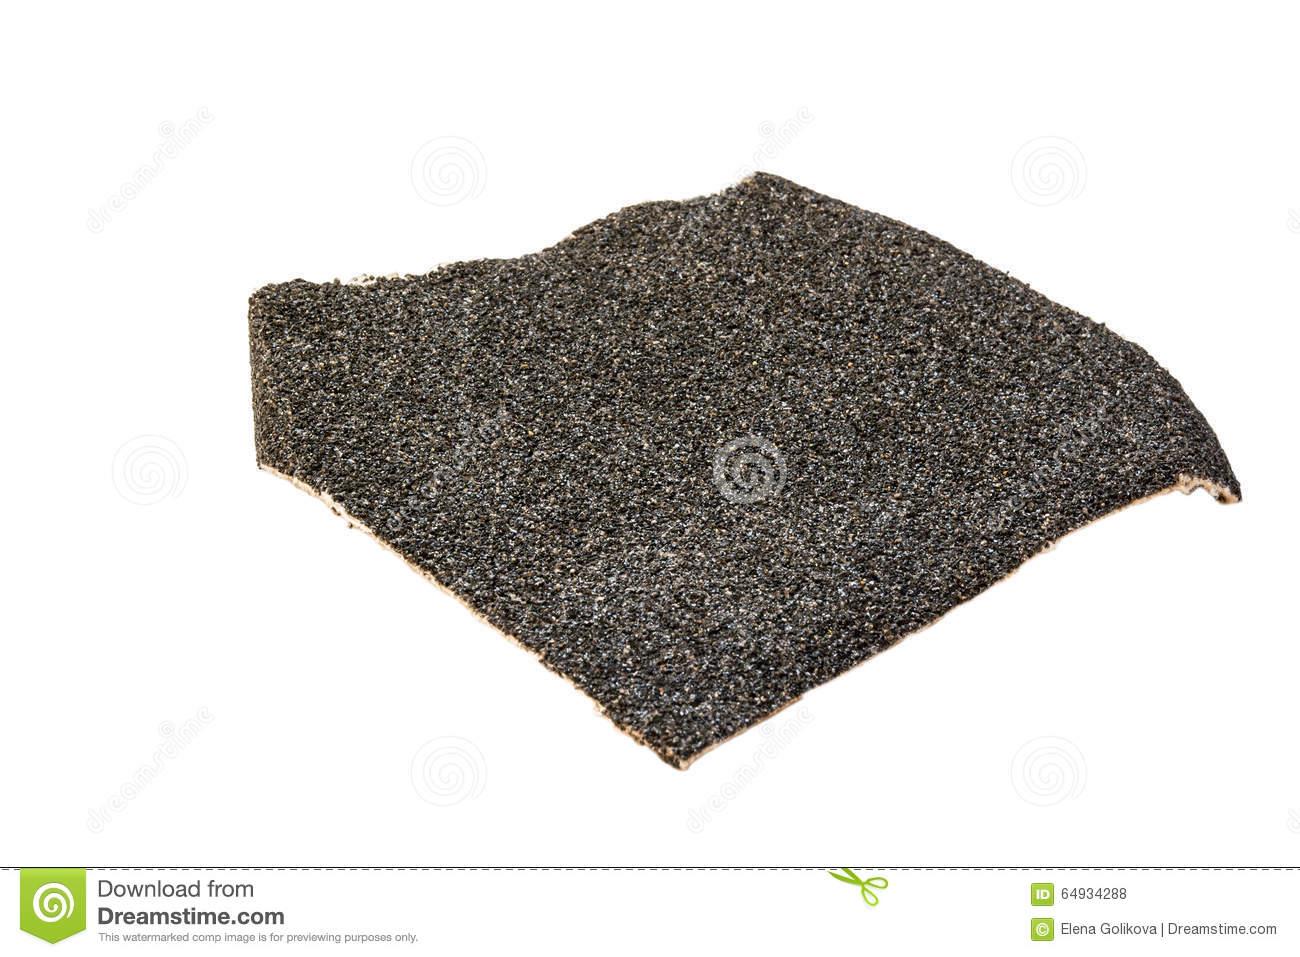 Abrasive paper clipart #2